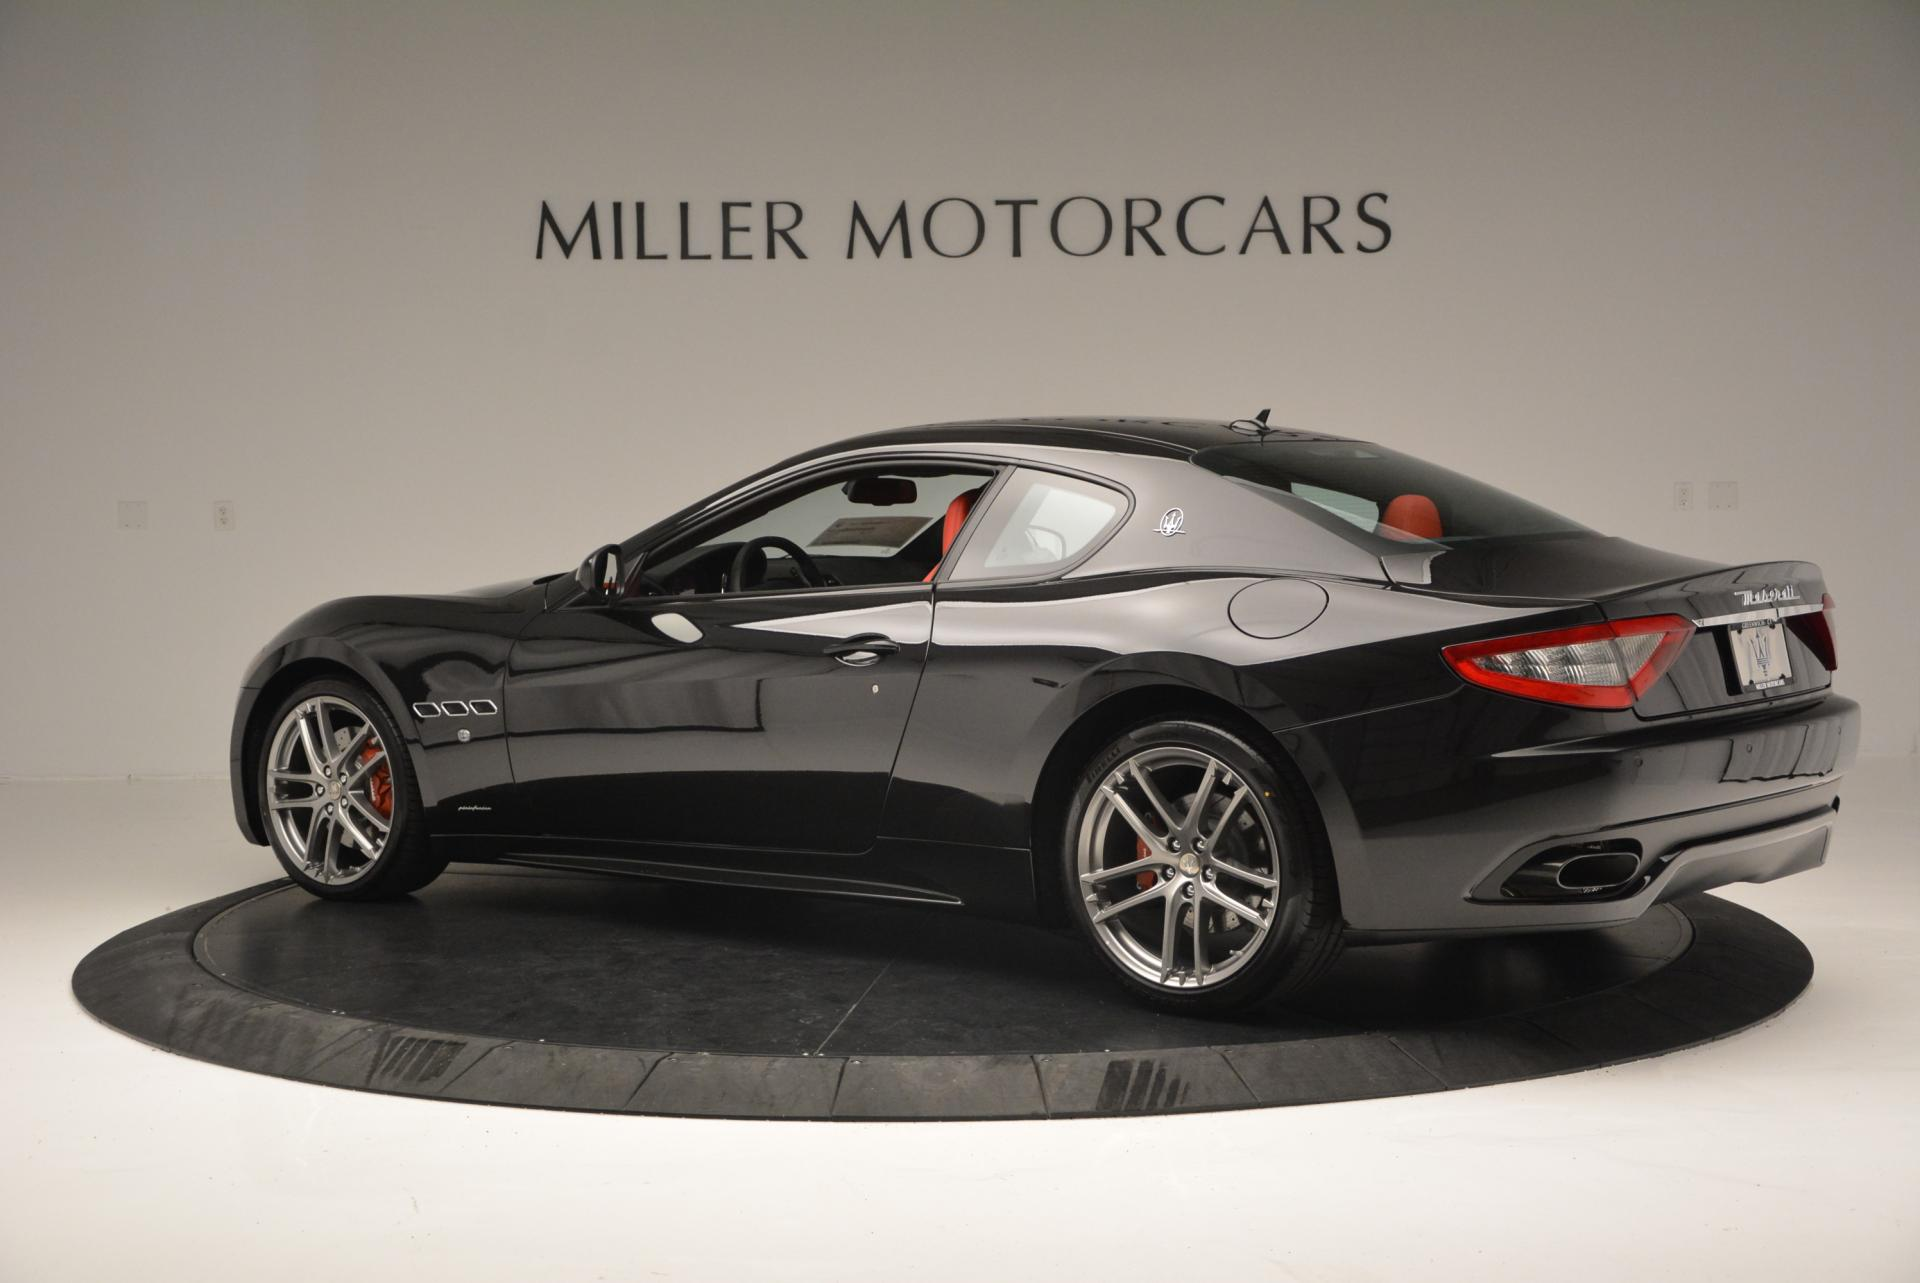 New 2016 Maserati GranTurismo Sport For Sale In Westport, CT 163_p4